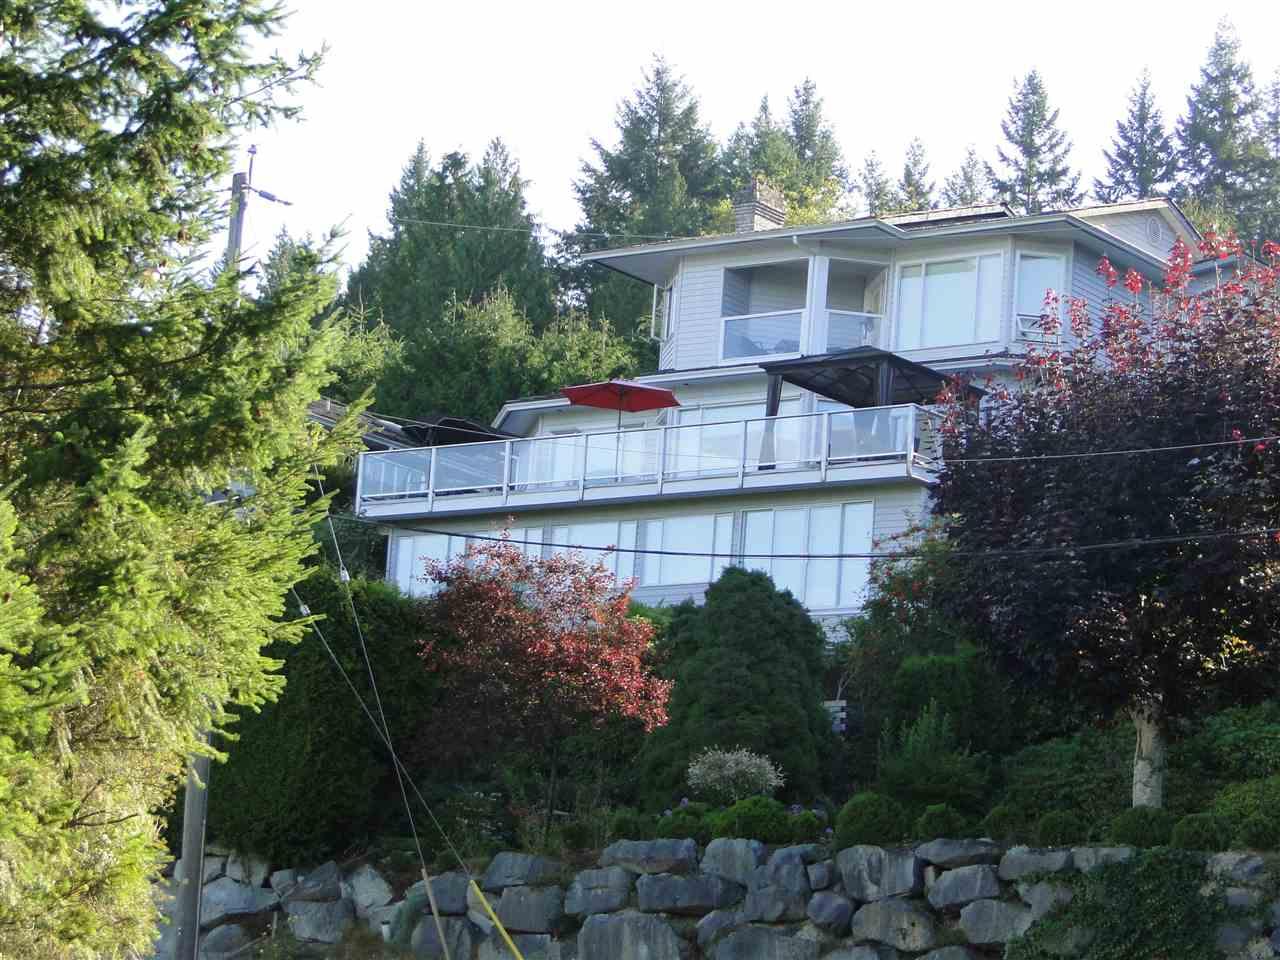 Detached at 5200 CHARTWELL ROAD, Sunshine Coast, British Columbia. Image 1